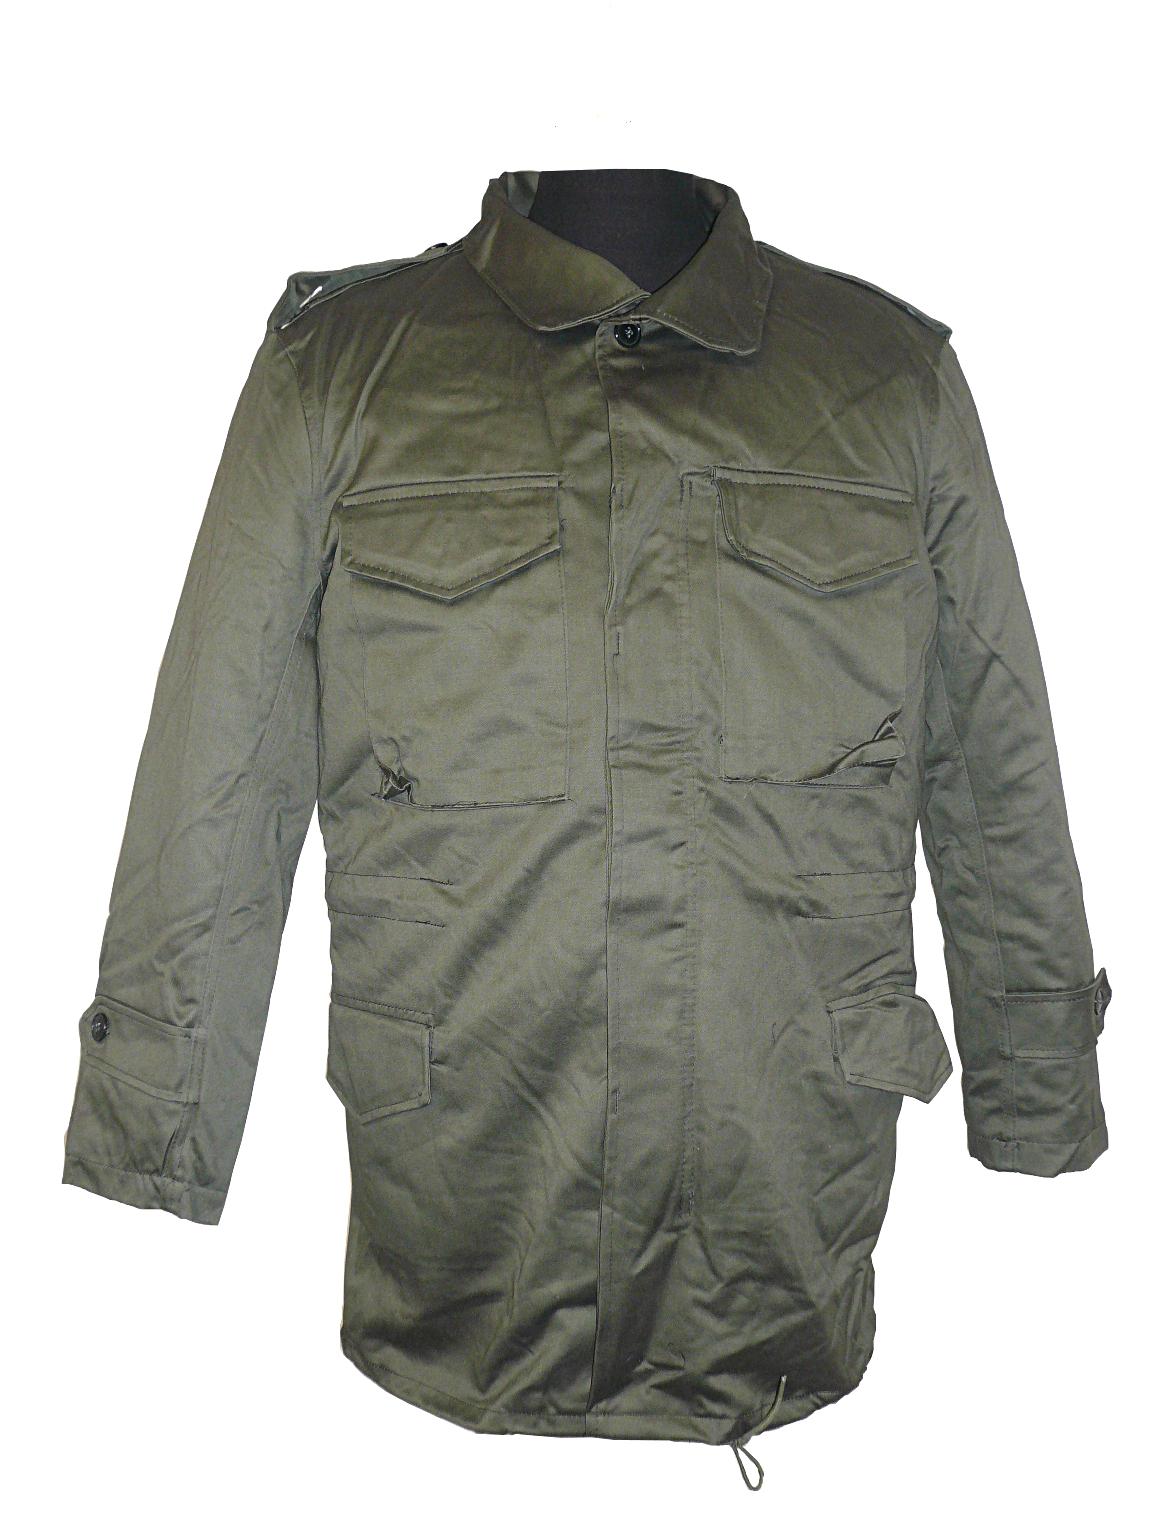 0f34632fe6e965 Greek Army OD M65 Jacket + Liner JKT15